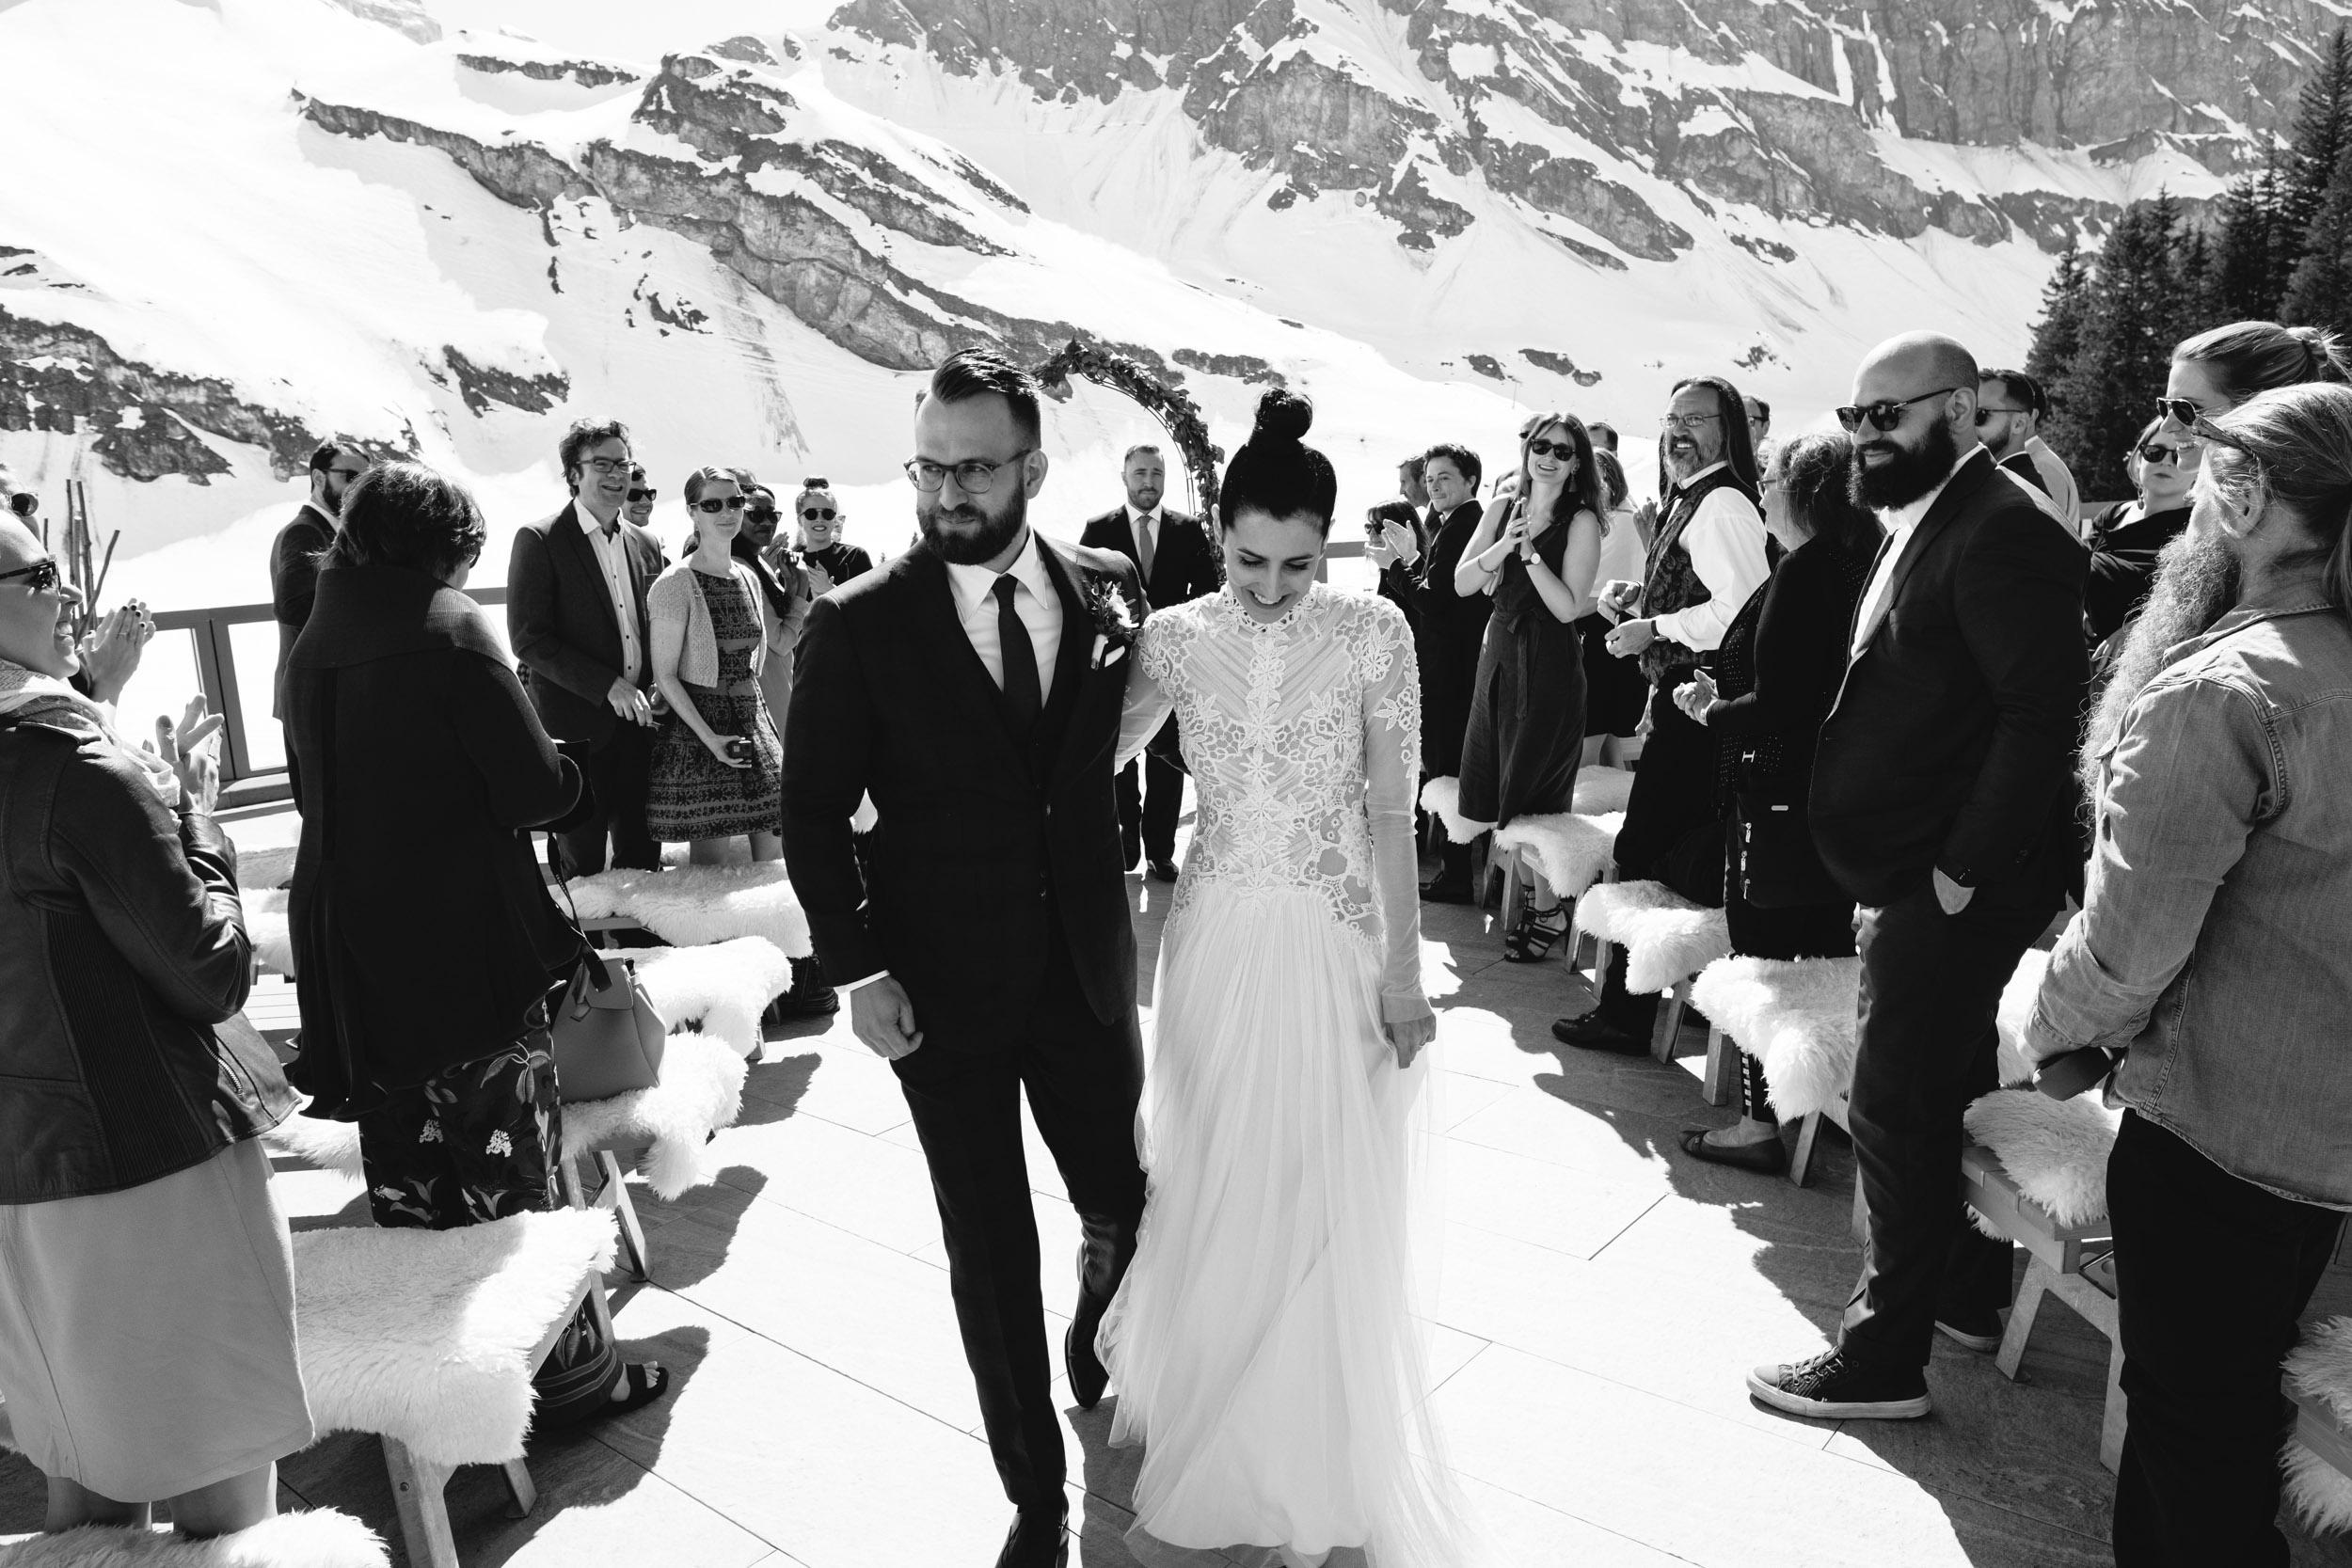 lynn-bastian-switzerland-wedding-photography-68.jpg